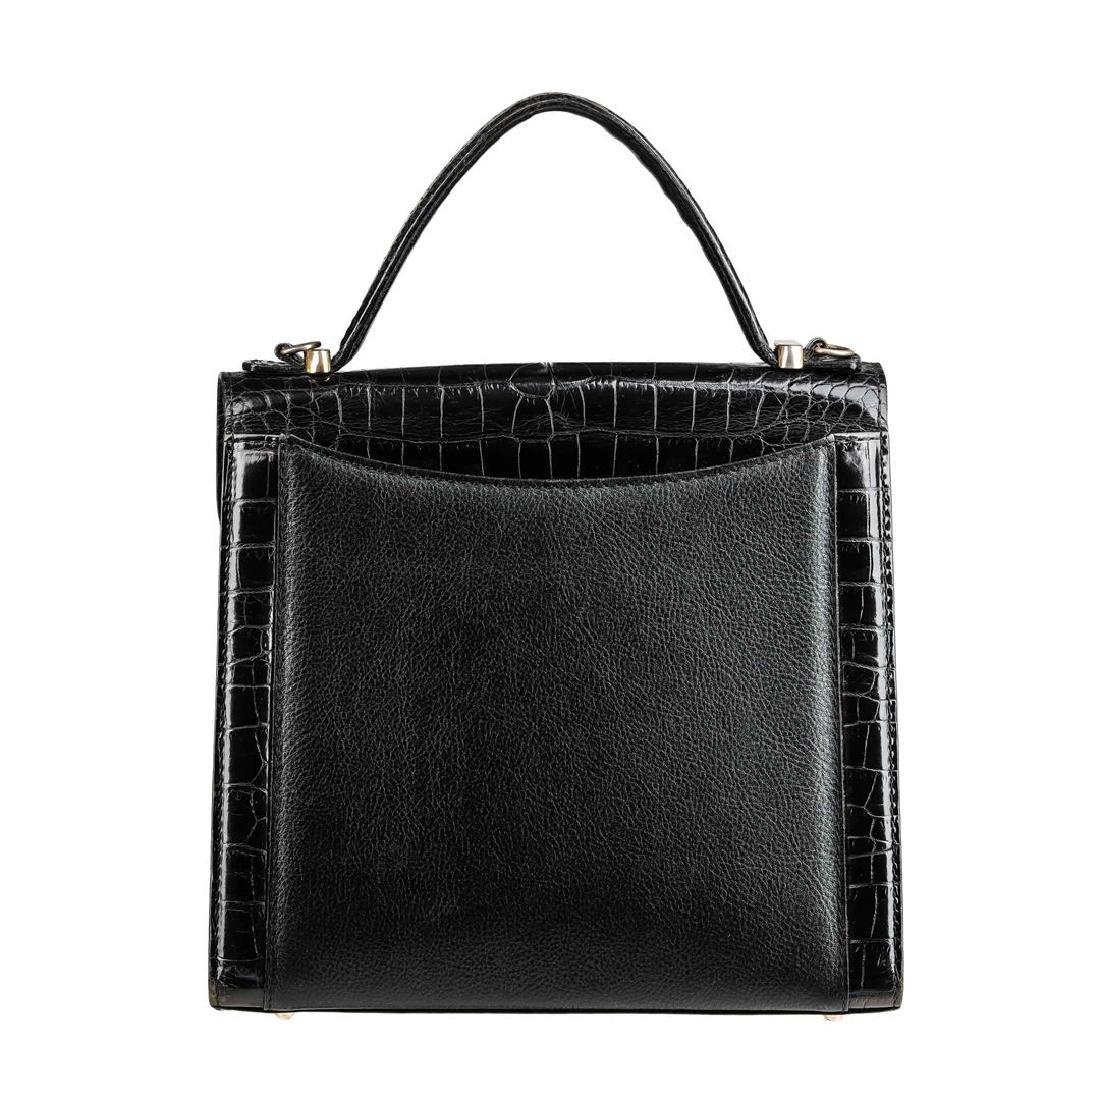 Bally Black Leather Handbag - 3